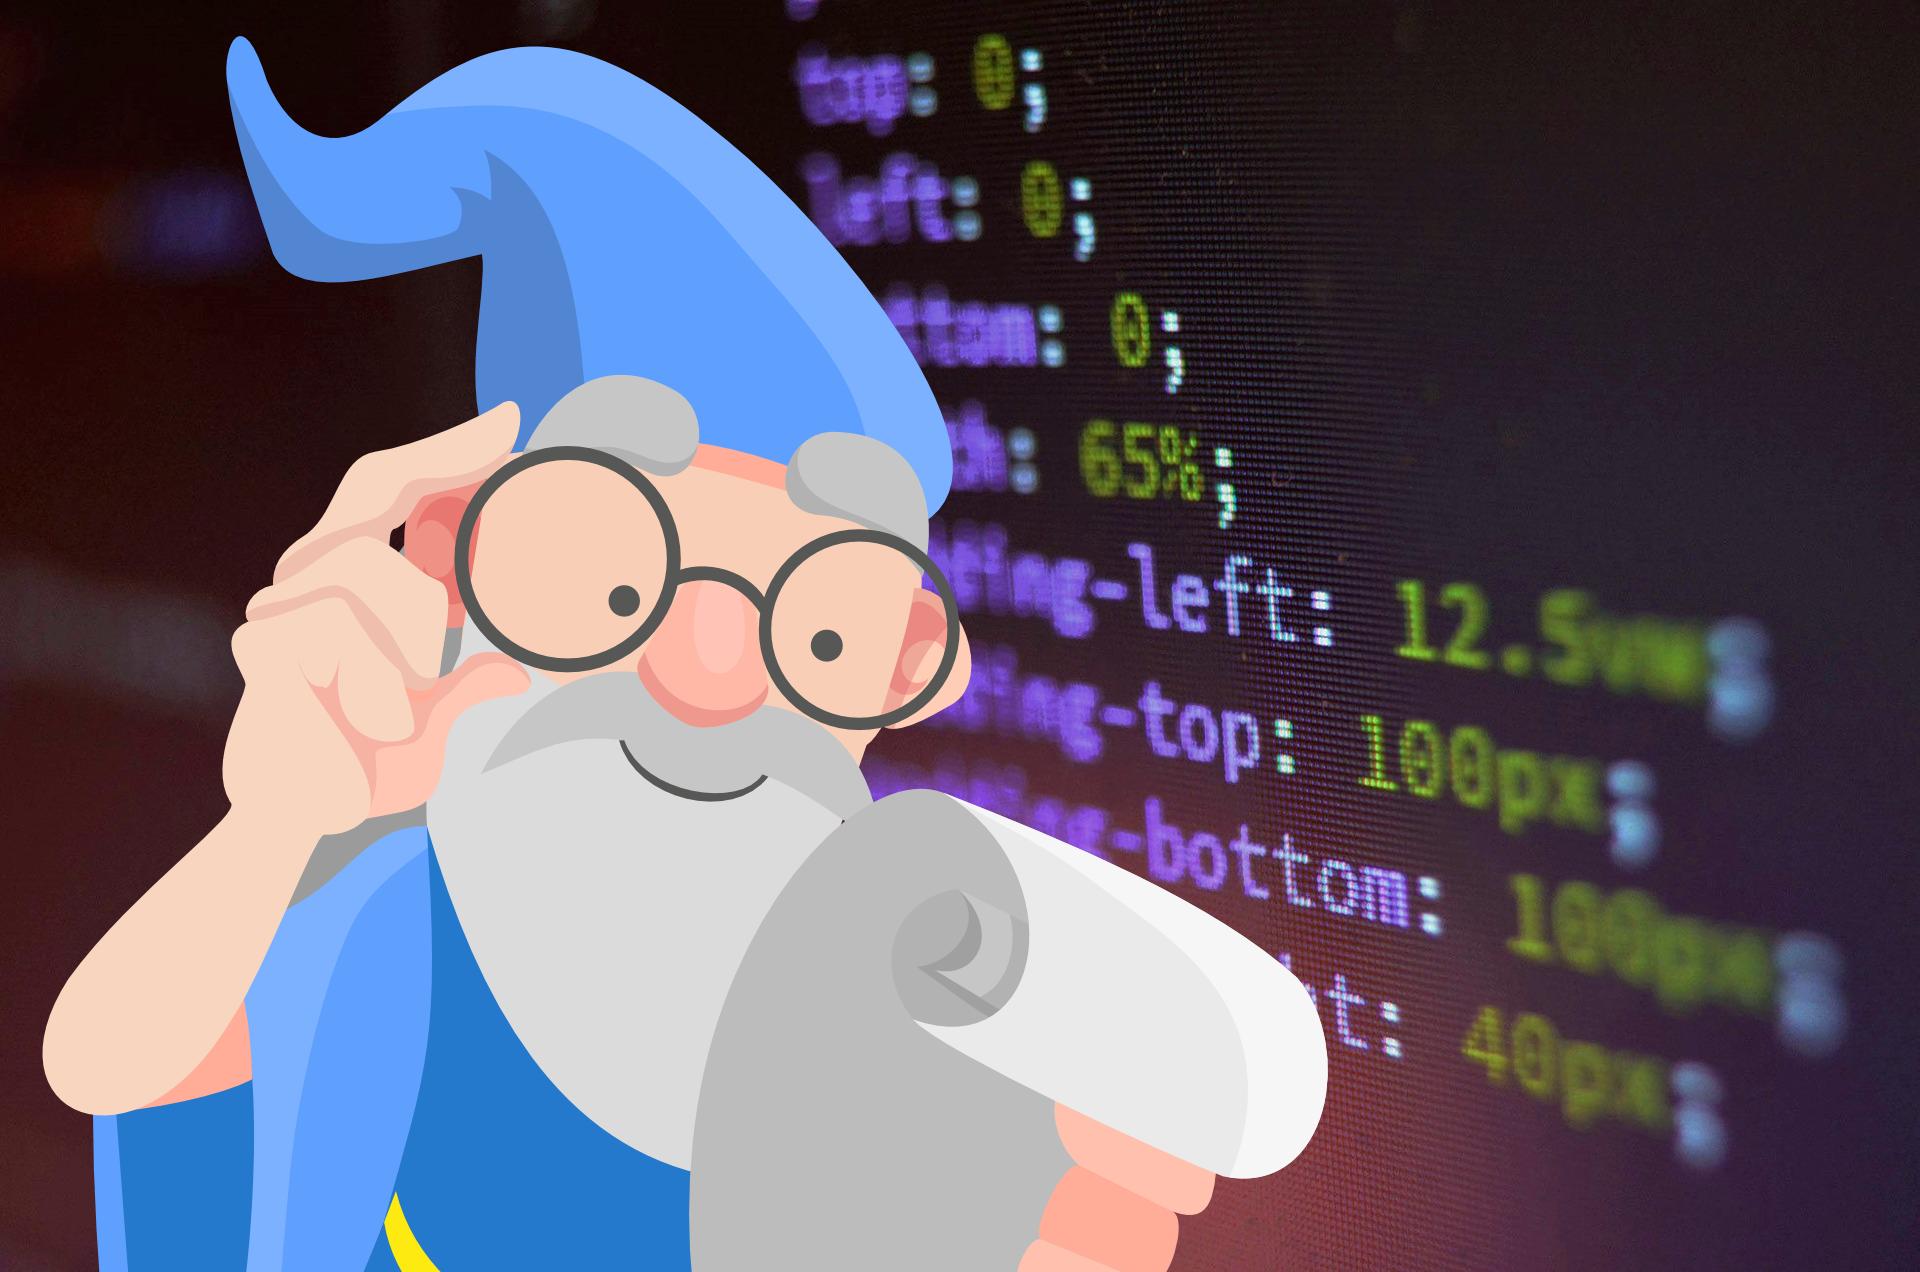 Wizard perusing CSS code